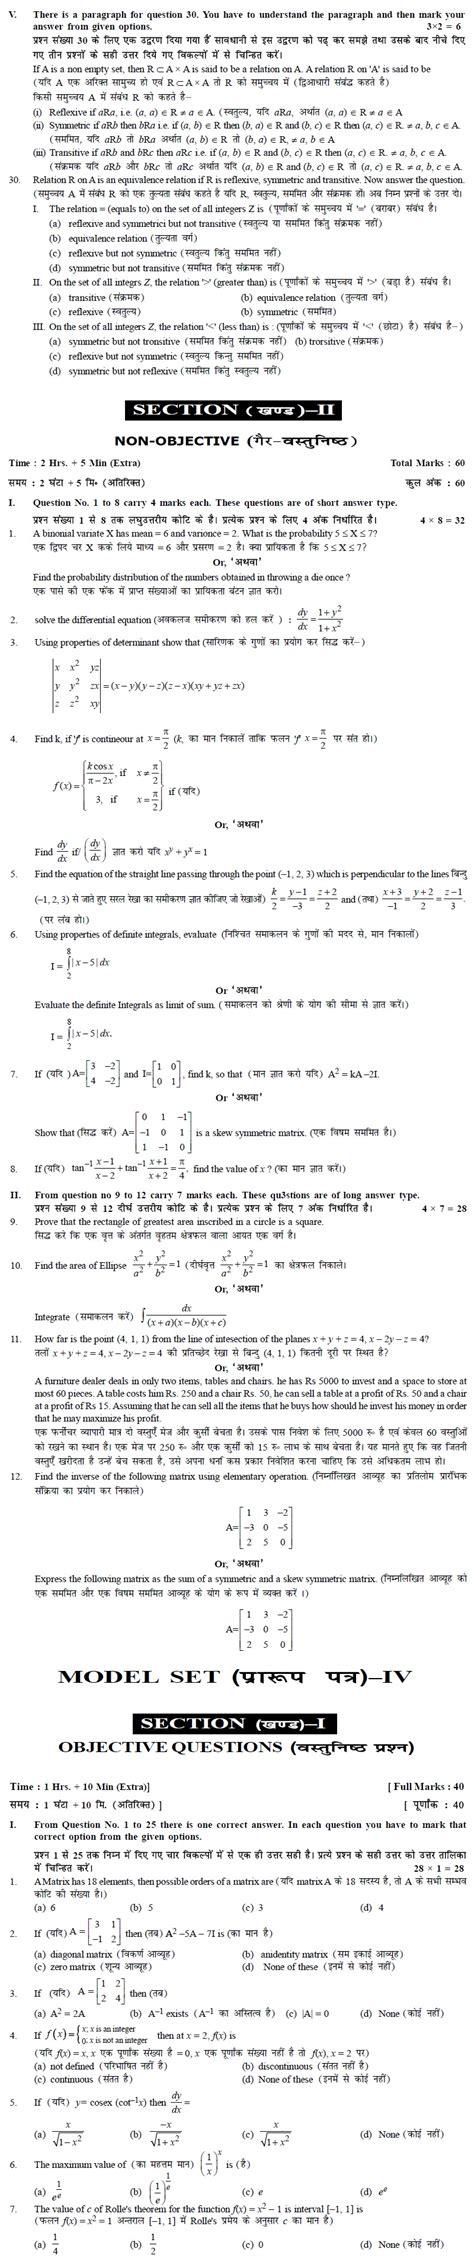 bihar board  model paper mathematics bseb model